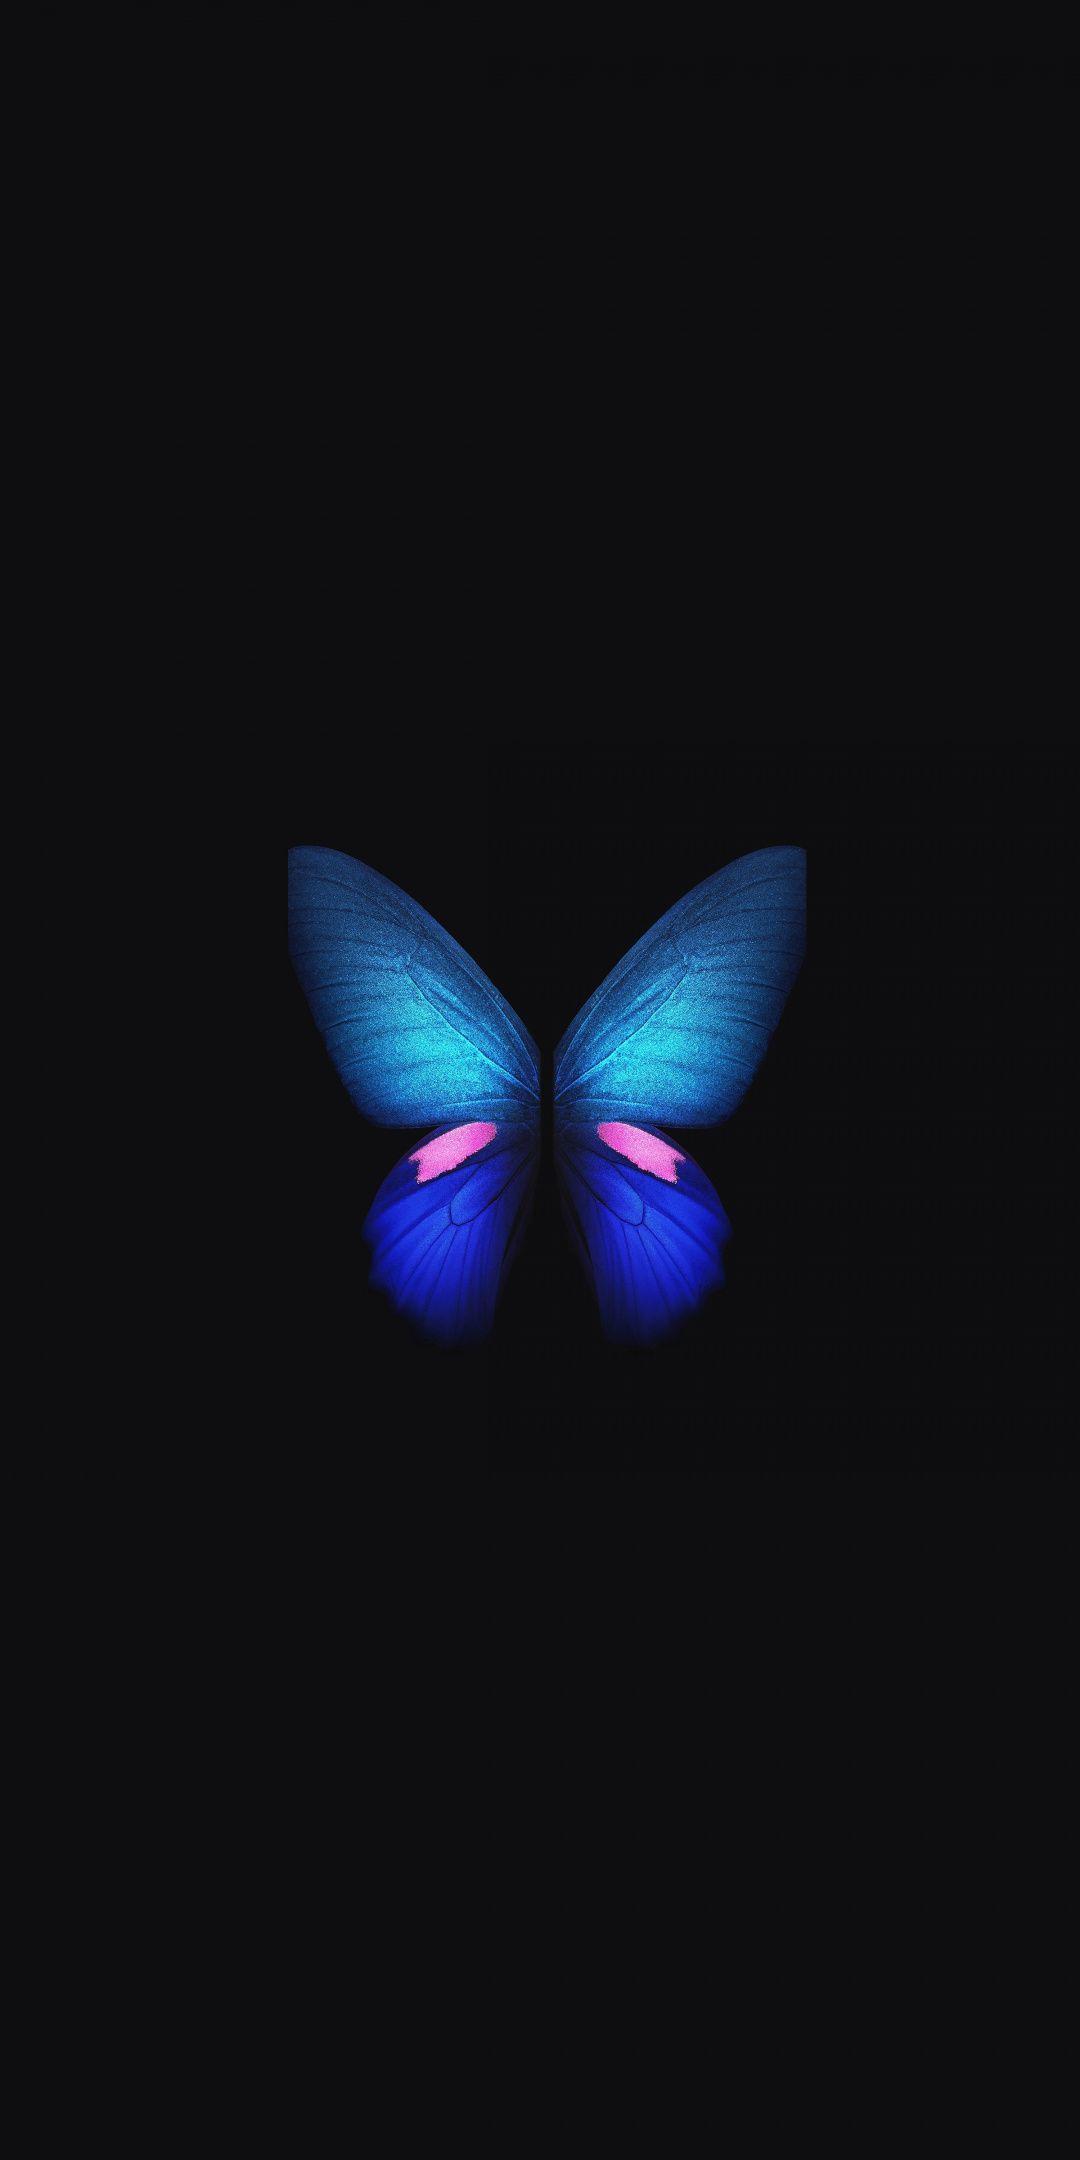 Samsung Galaxy Fold Blue Butterfly Minimal Art 1080x2160 Wallpaper Butterfly Wallpaper Iphone Blue Butterfly Wallpaper Blue Galaxy Wallpaper